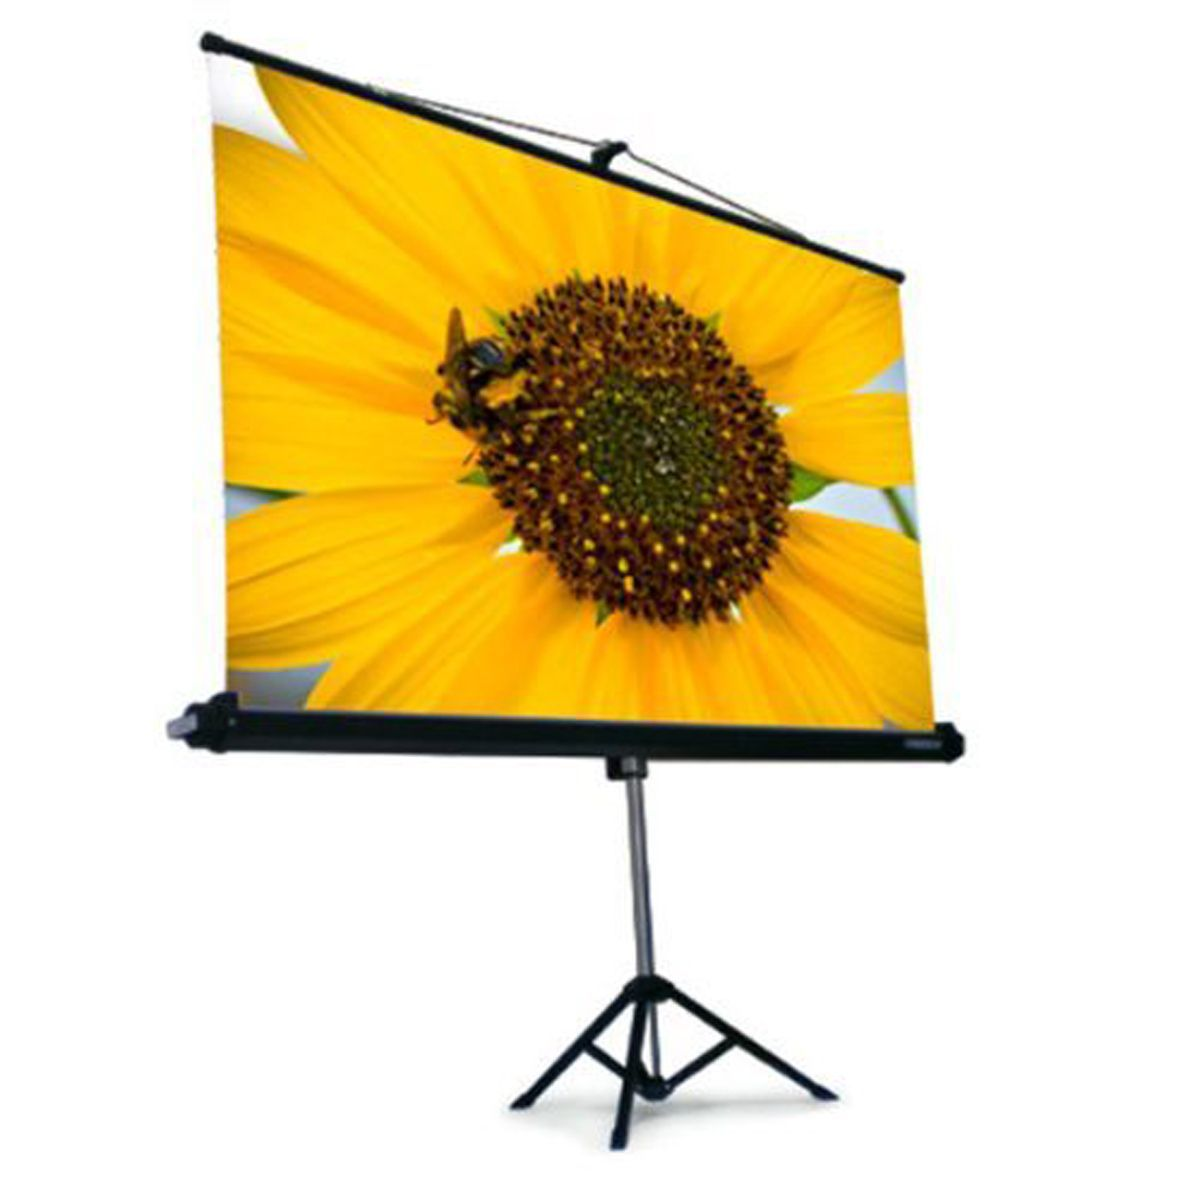 TELA PROJEÇÃO TRIPE TBTPS72V (147x110cm) 4:3 Trace Board